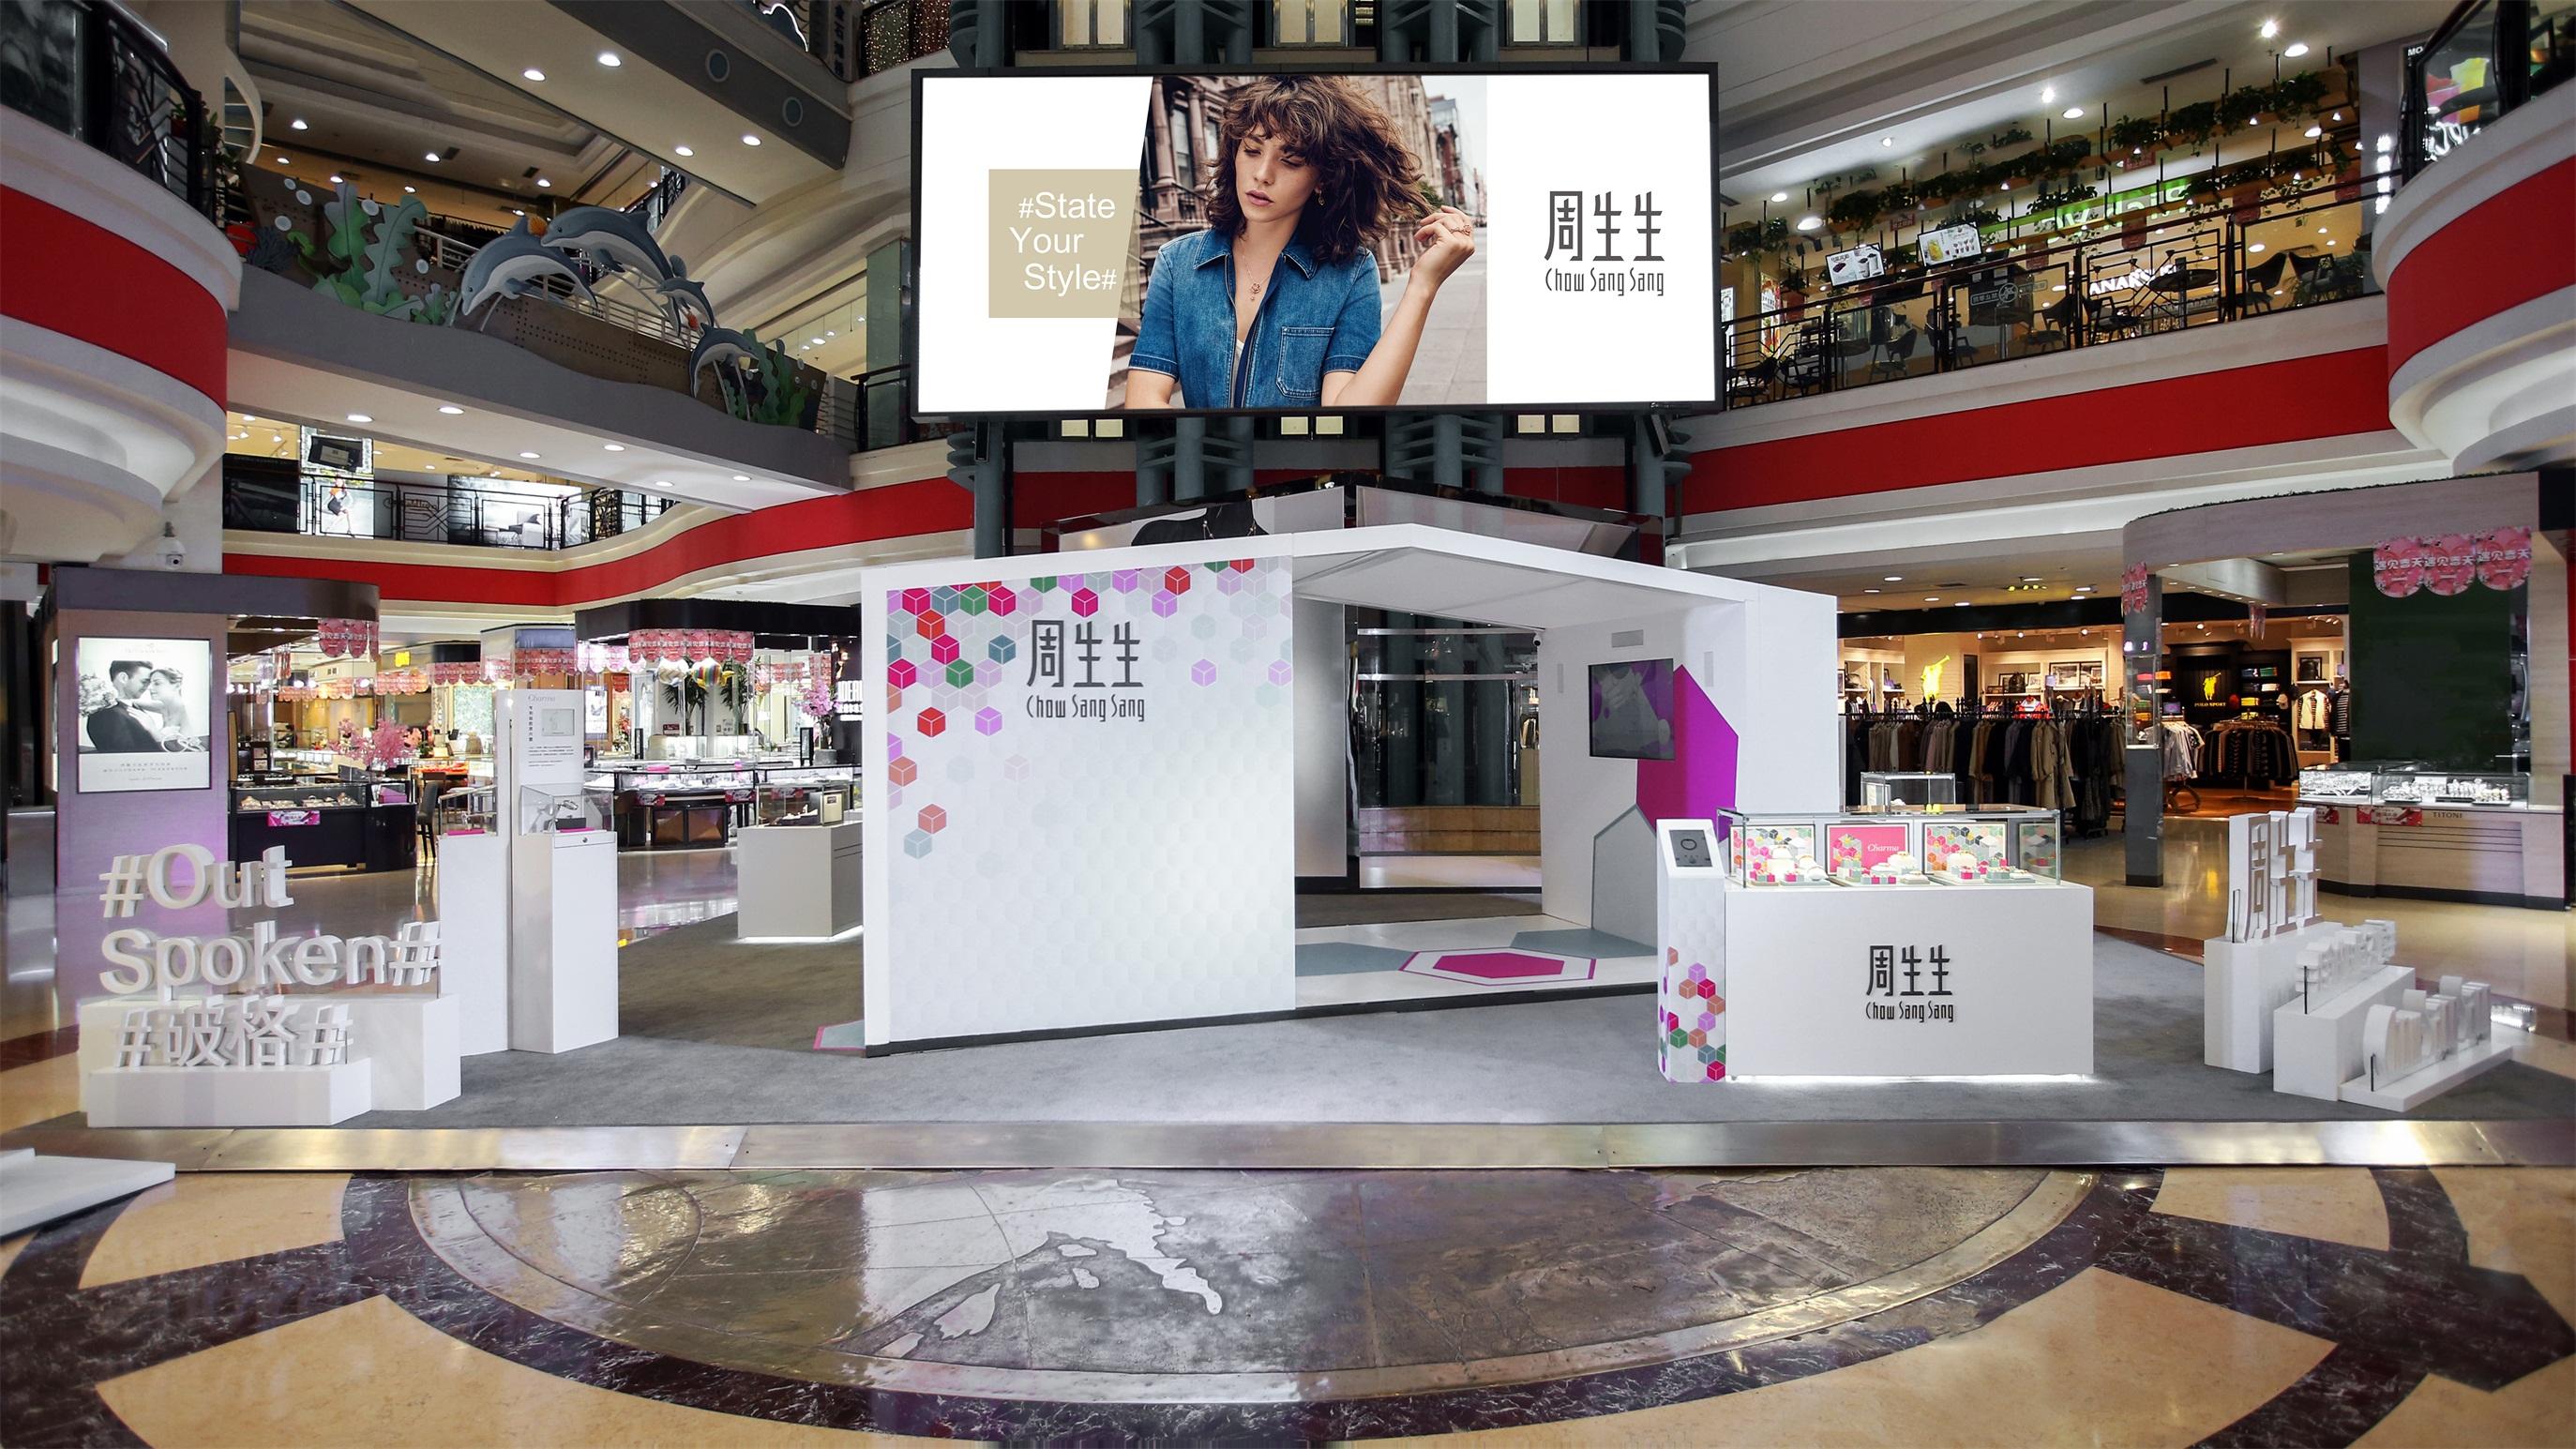 Daily Wear 珠宝全国巡展活动展示区之一 创意音乐盒#自由随性# -1